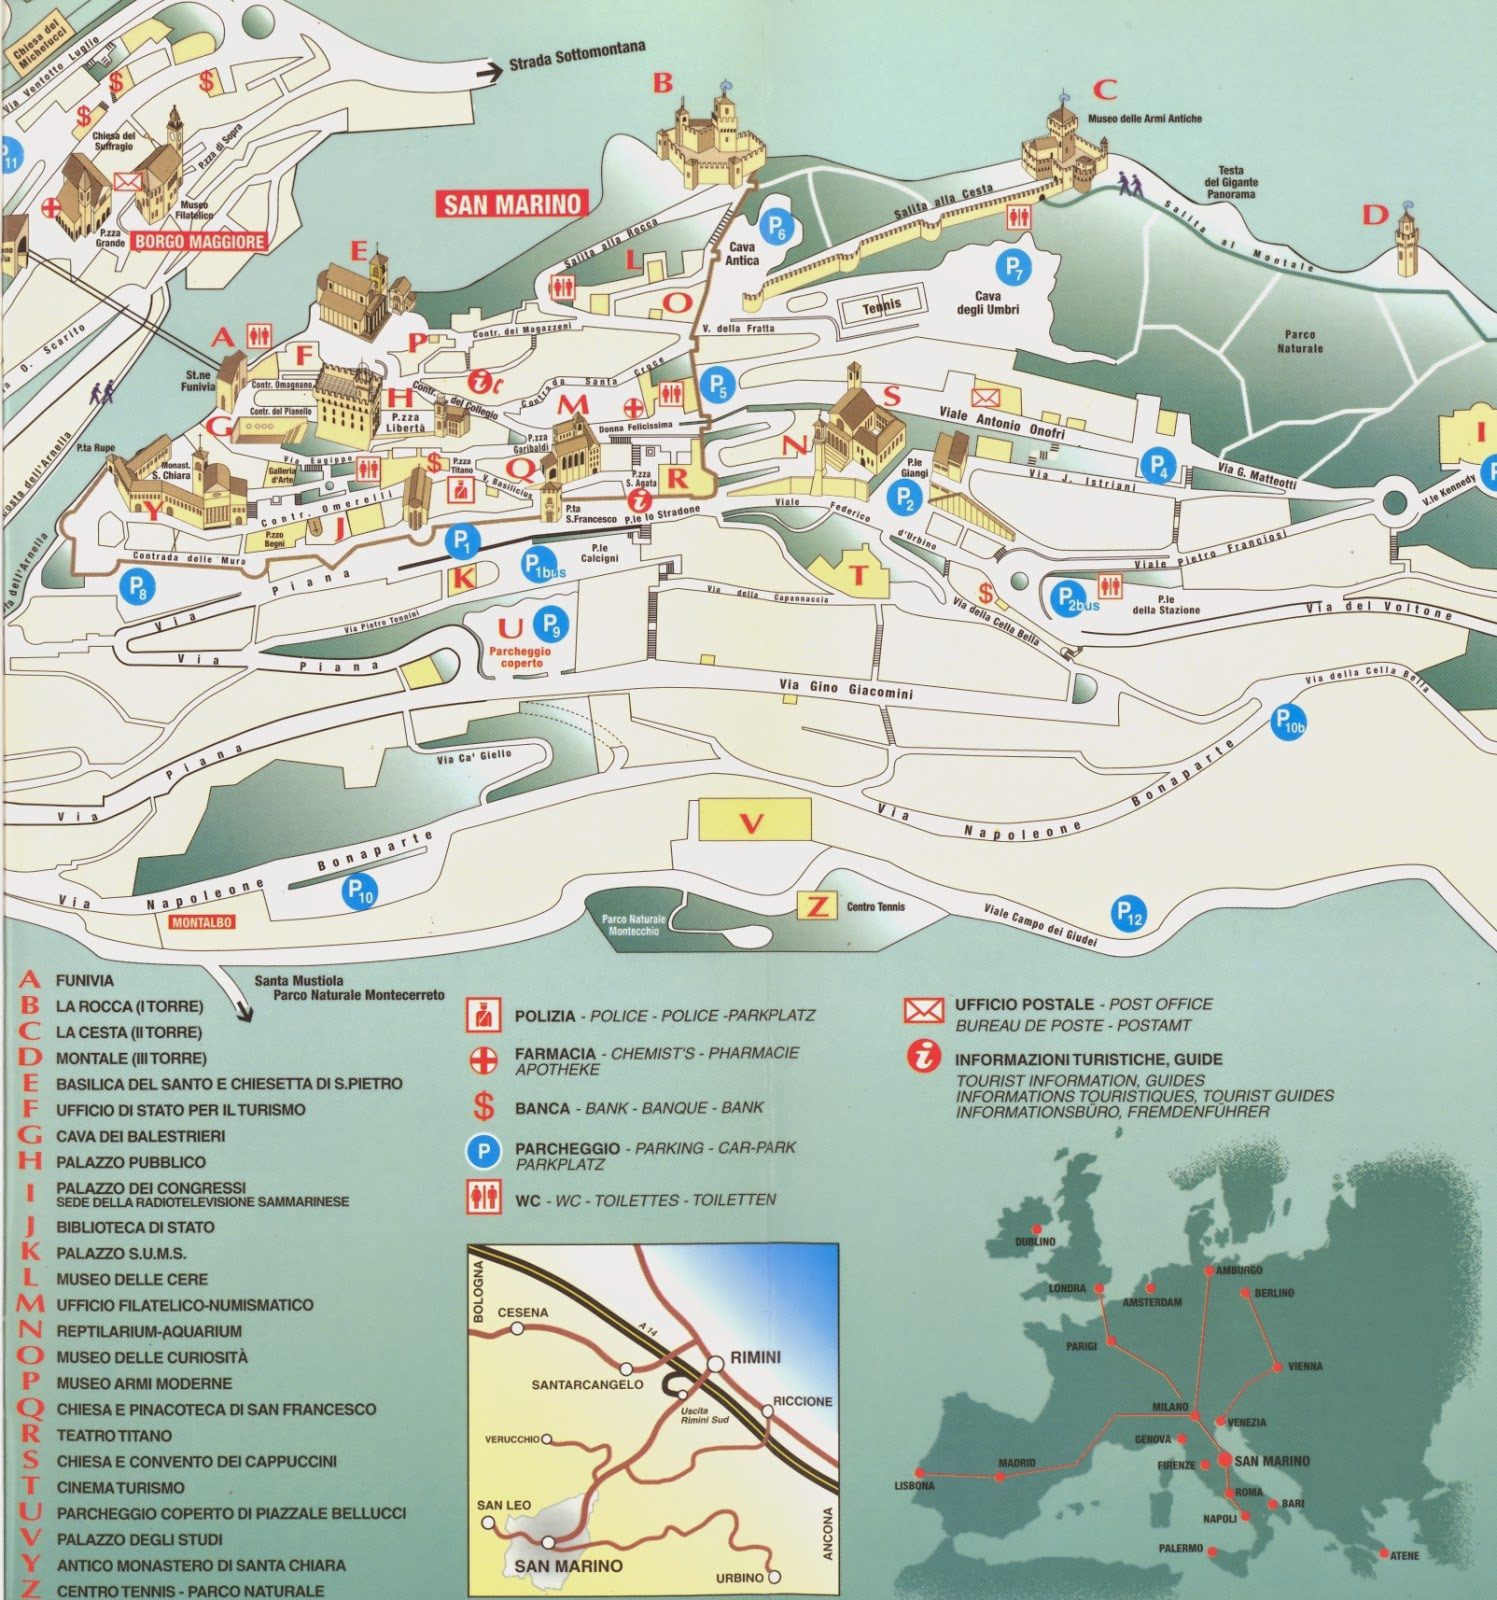 Plano de San Marino